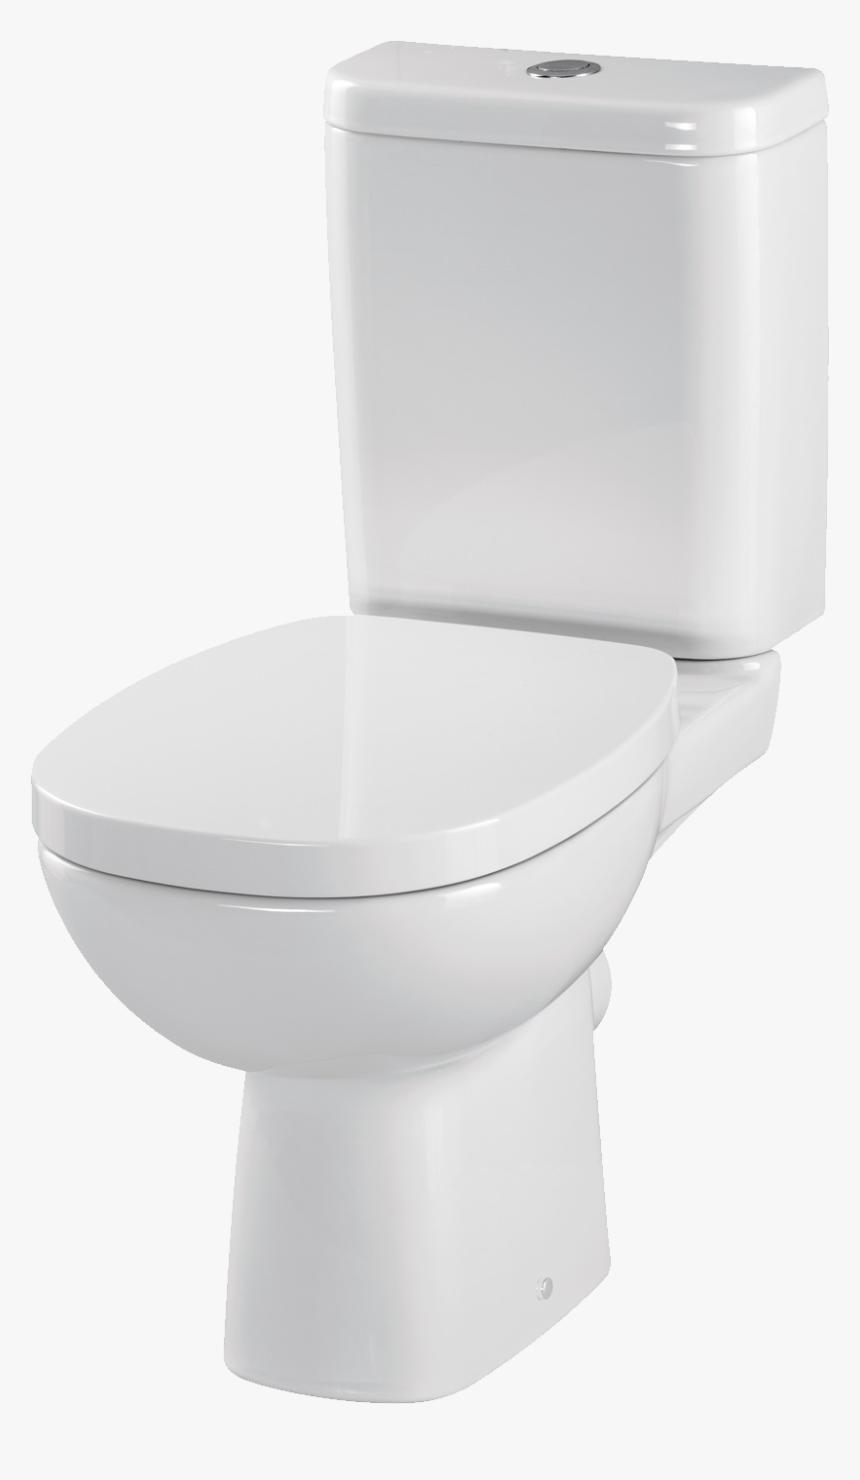 Toilet Png - Kit Vaso Sanitario Com Caixa Acoplada Incepa, Transparent Png, Free Download